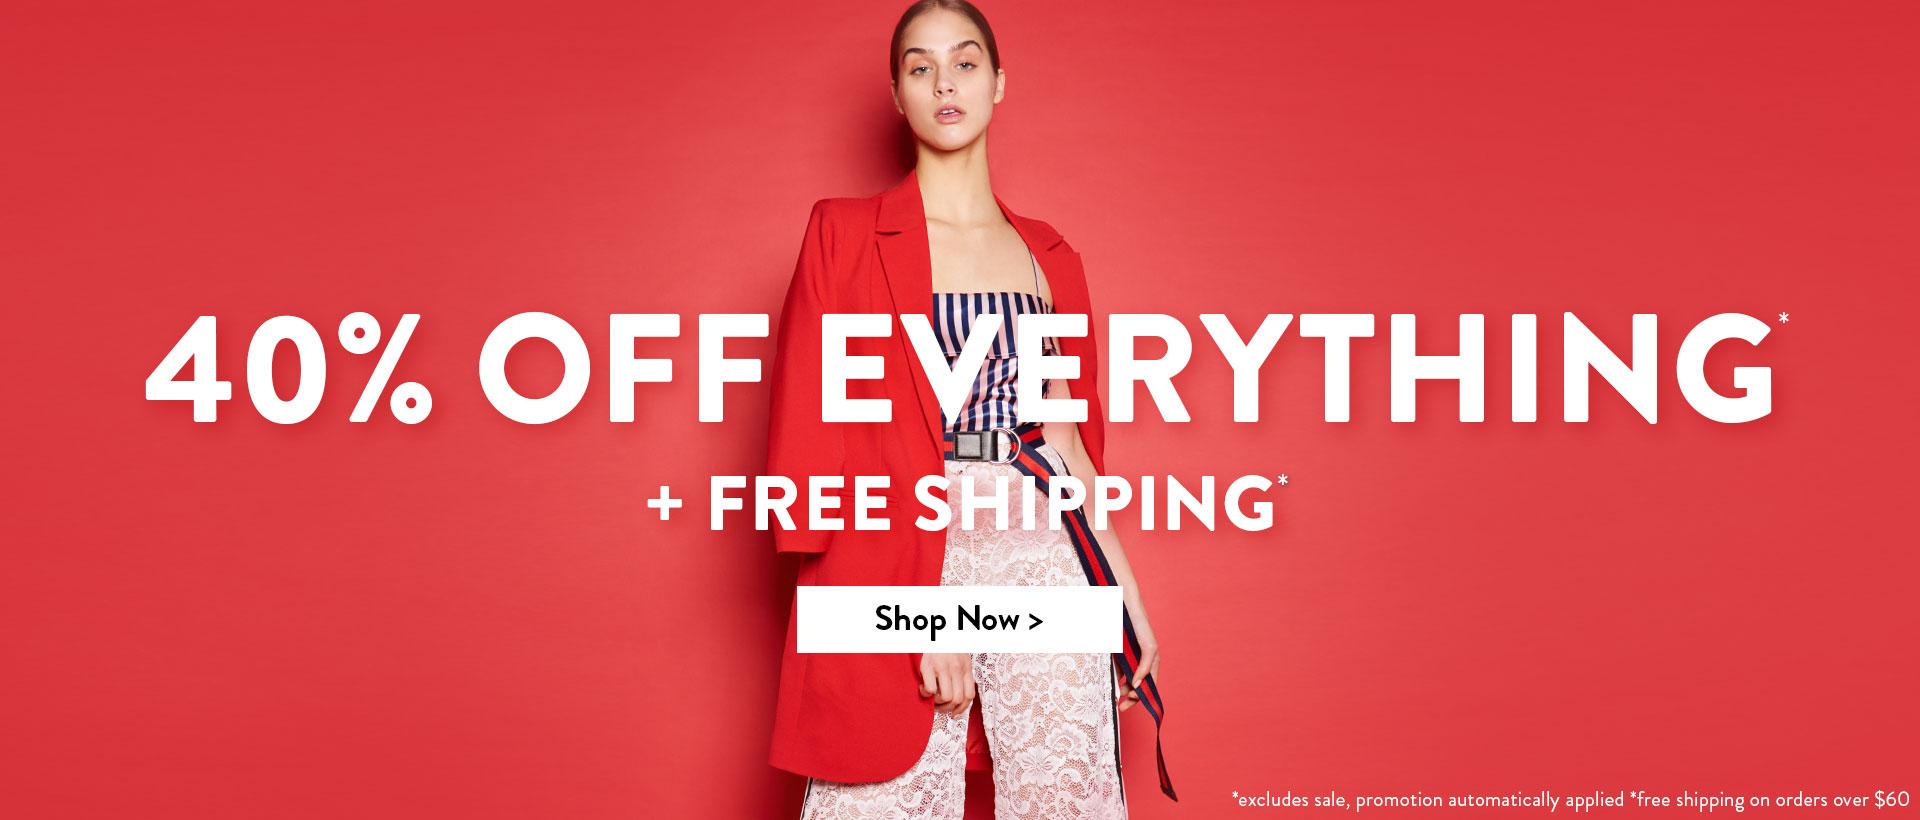 Boohoo Australia S Promotions Fashion Retailer